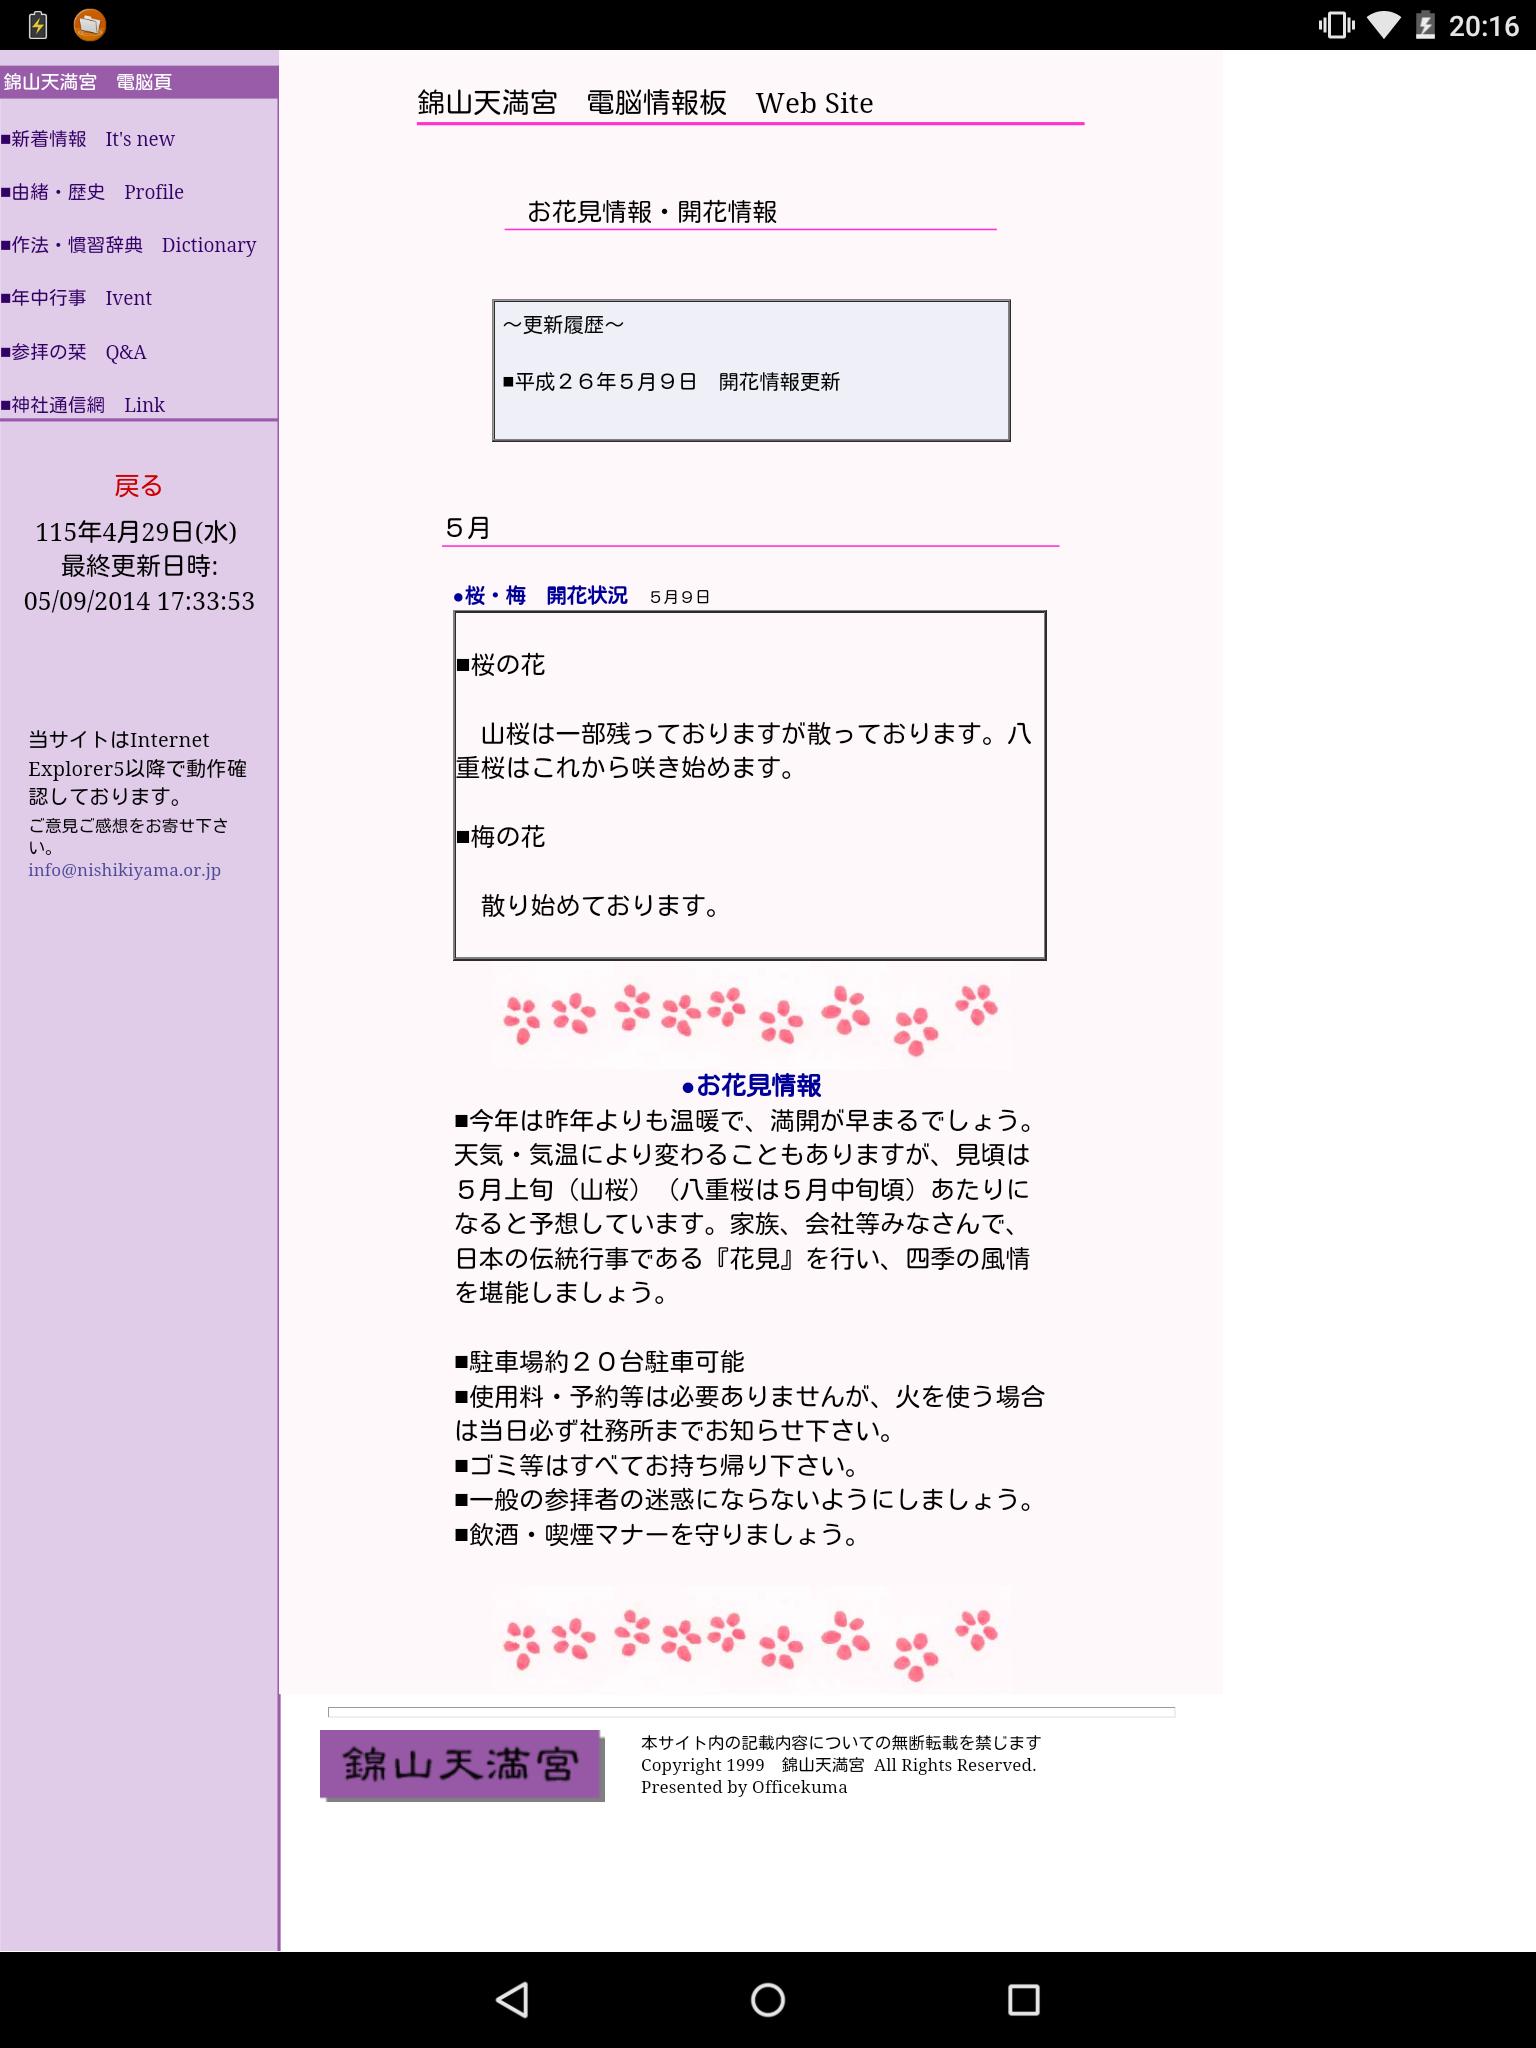 Screenshot_2015-04-29-20-16-56